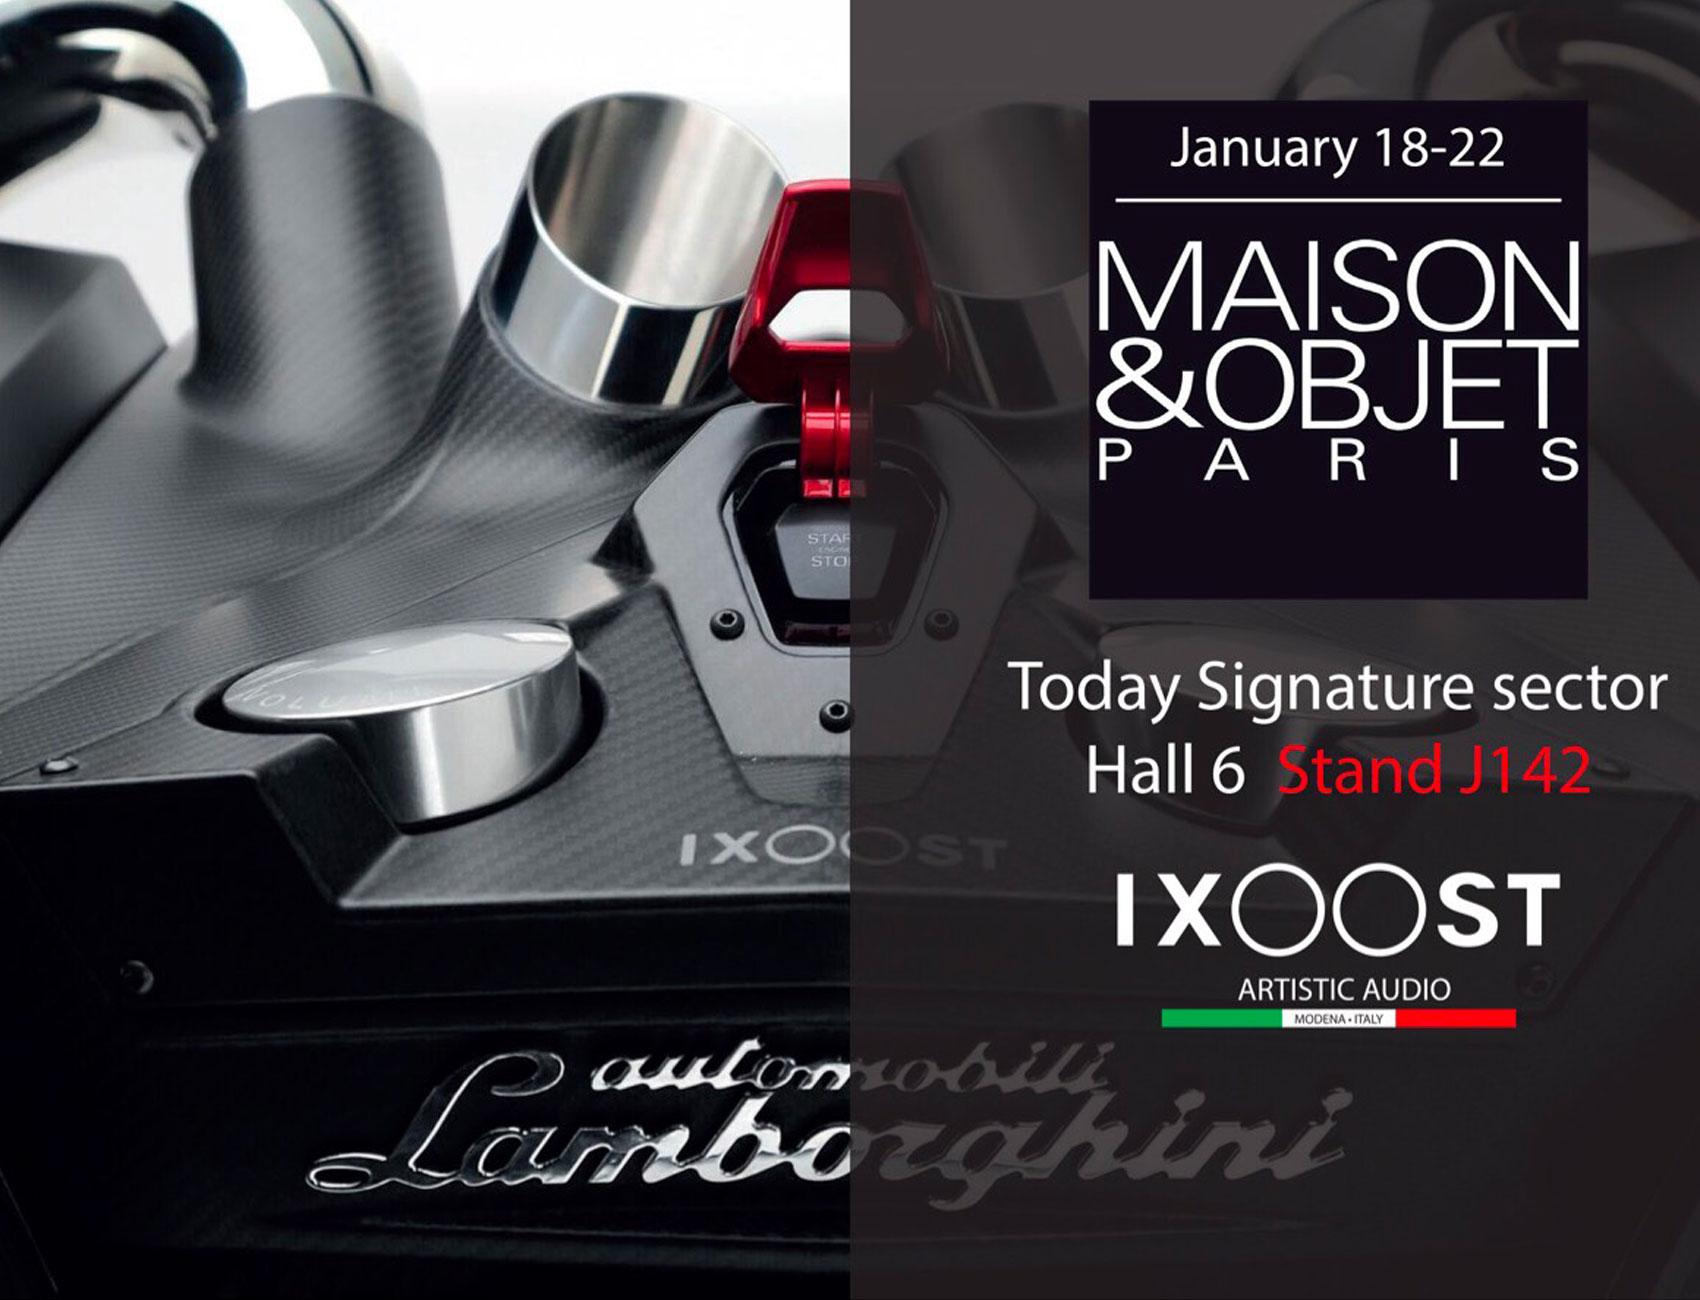 iXOOST impianti stereo partecipa al Maison&Objet 2019